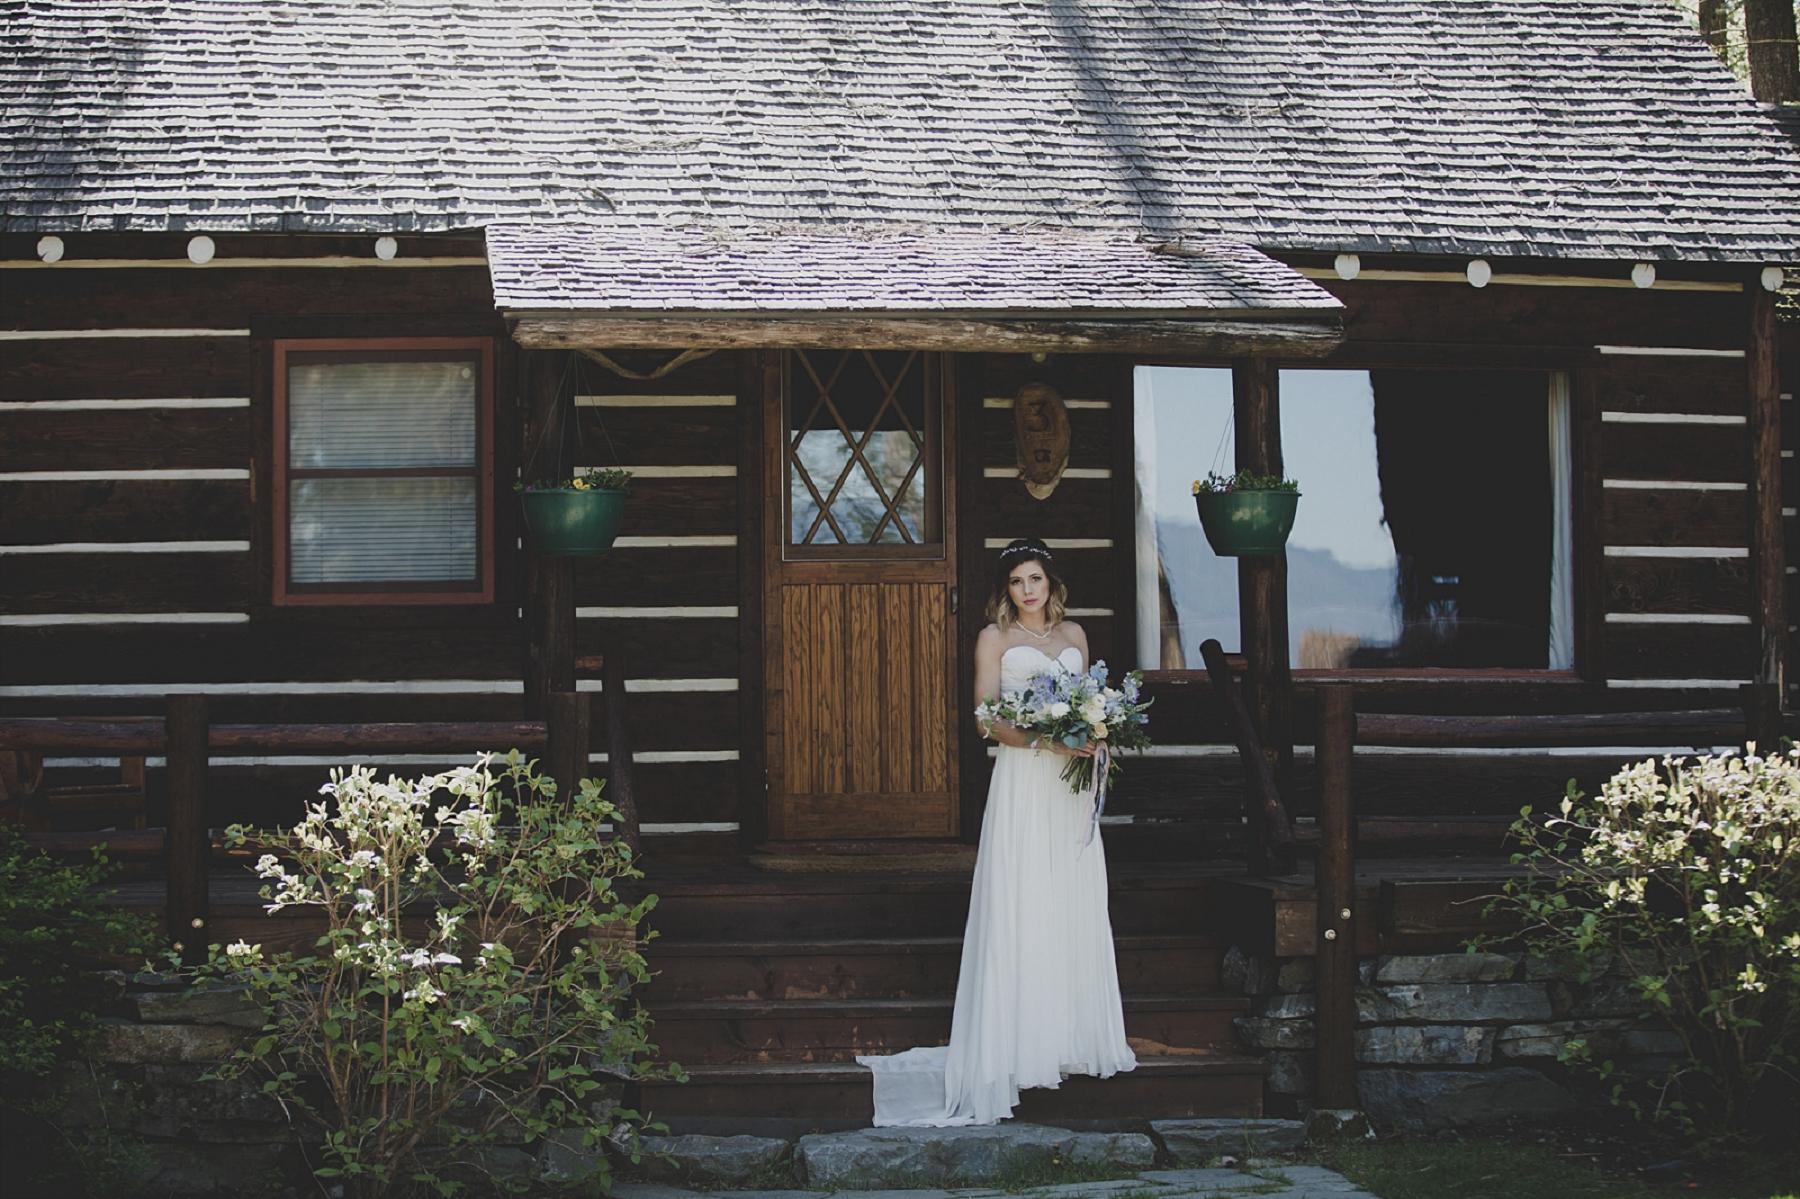 Jennifer_Mooney_Photo_Flathead_Lake_Lodge_Styled_Shoot_00015 - Copy.jpg